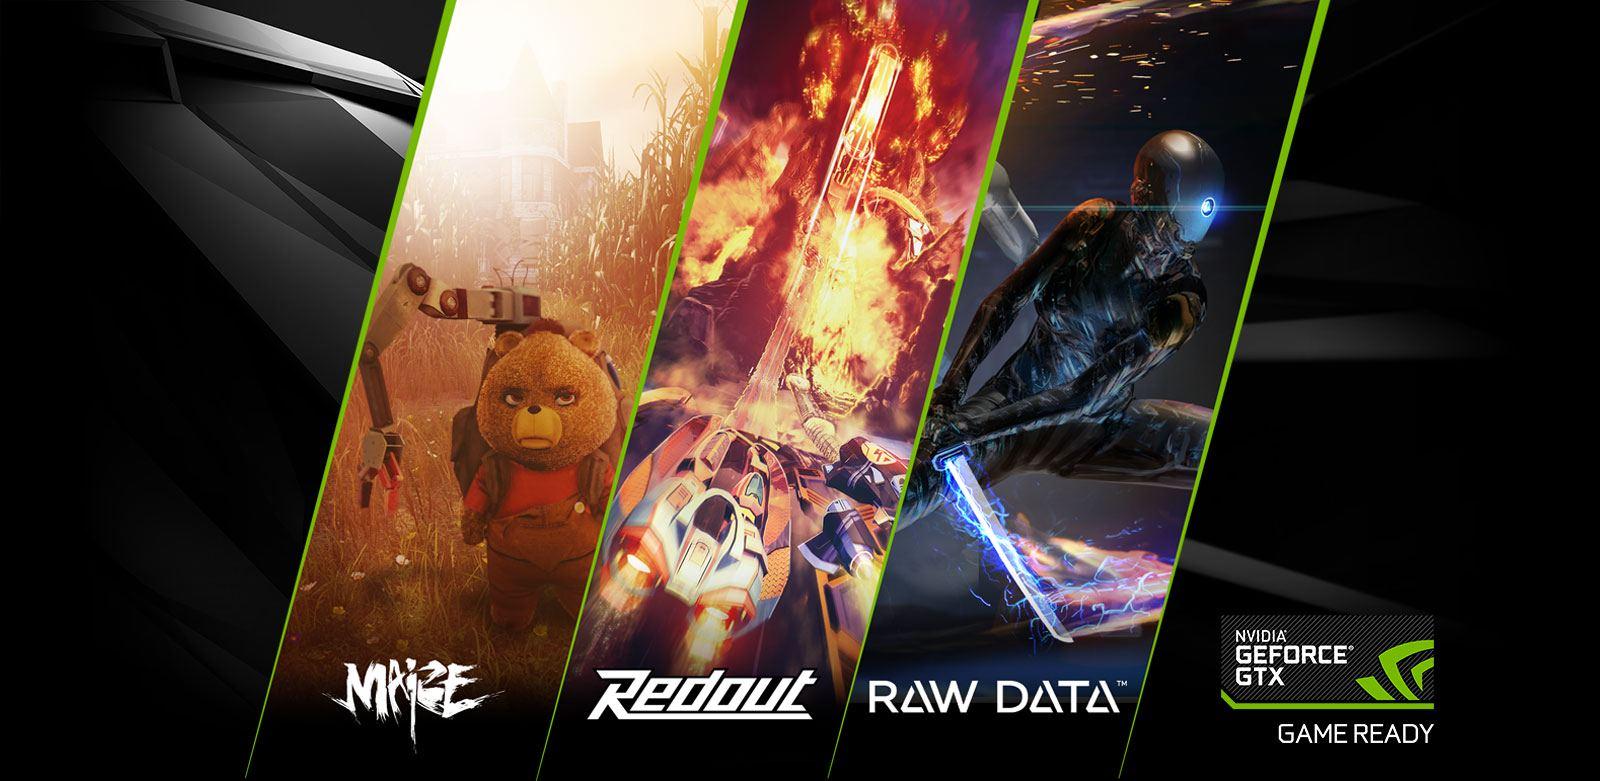 header ซื้อการ์ดจอ EVGA GeForce GTX 1060, 1050 Ti หรือ 1050 เลือกรับเกมส์ Maize, Redout หรือ Raw Data ไปแบบฟรีๆ